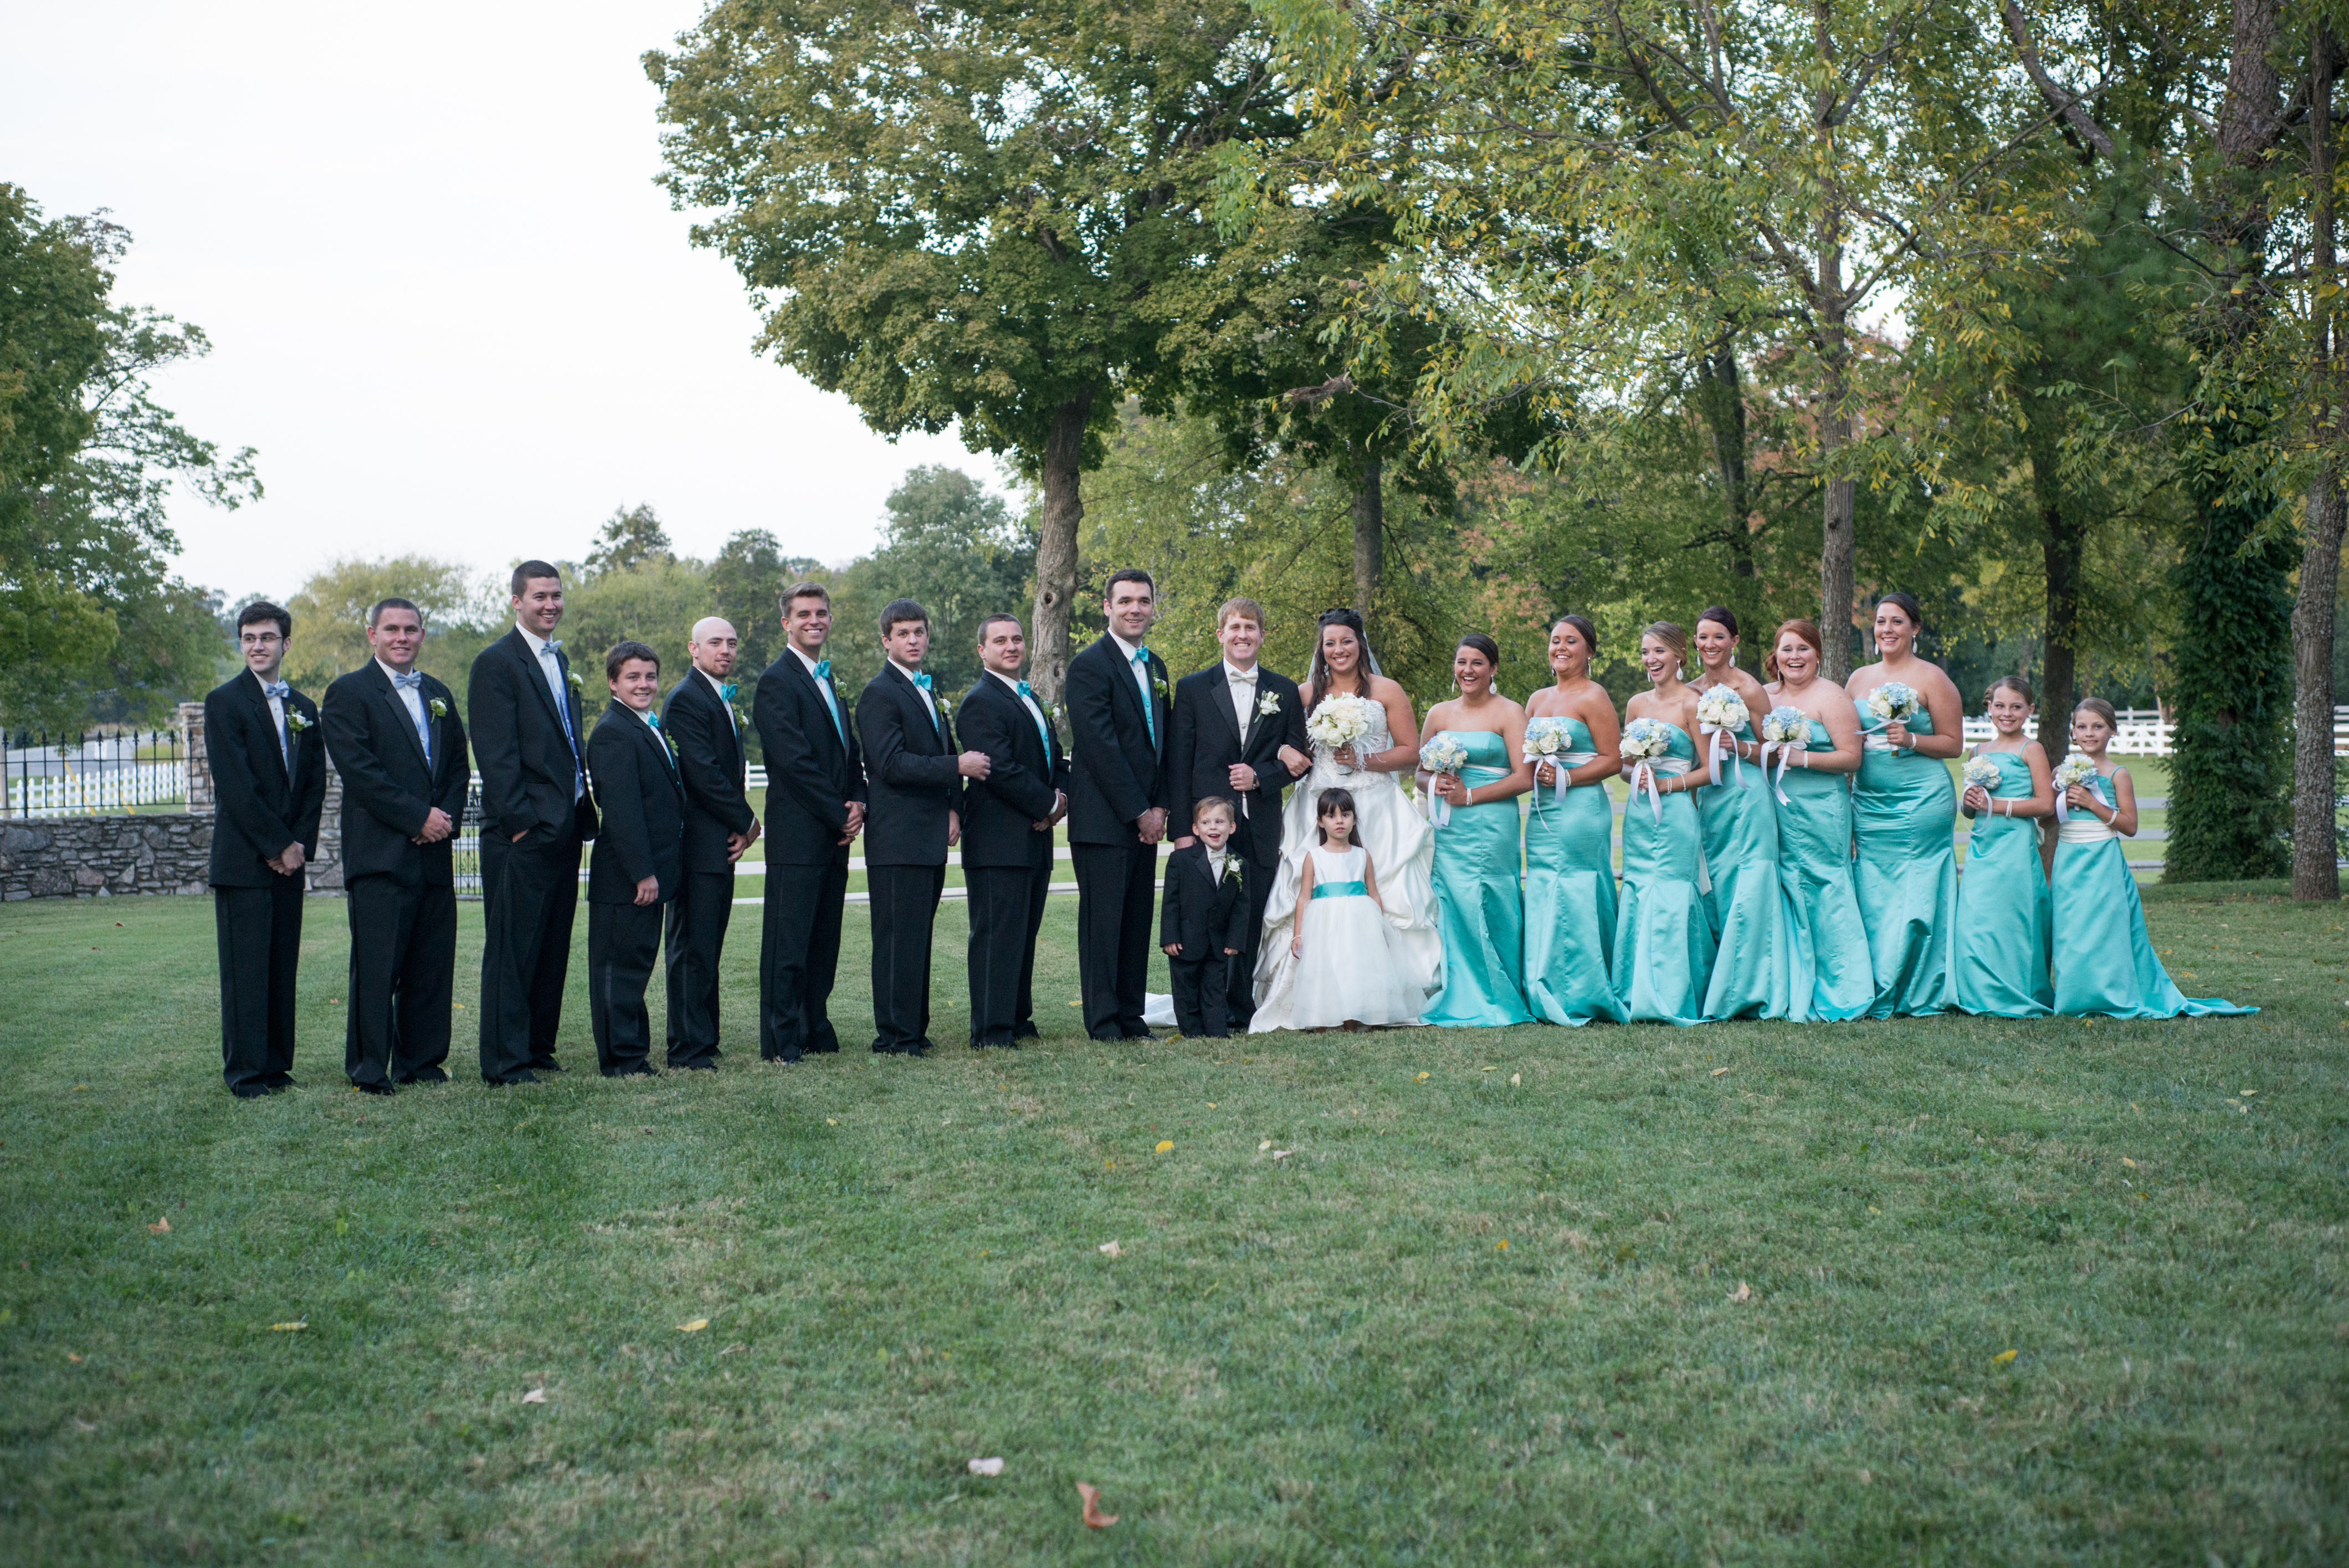 Matt-Blakely-wedding-nashville-tn-legacy-farms-1011